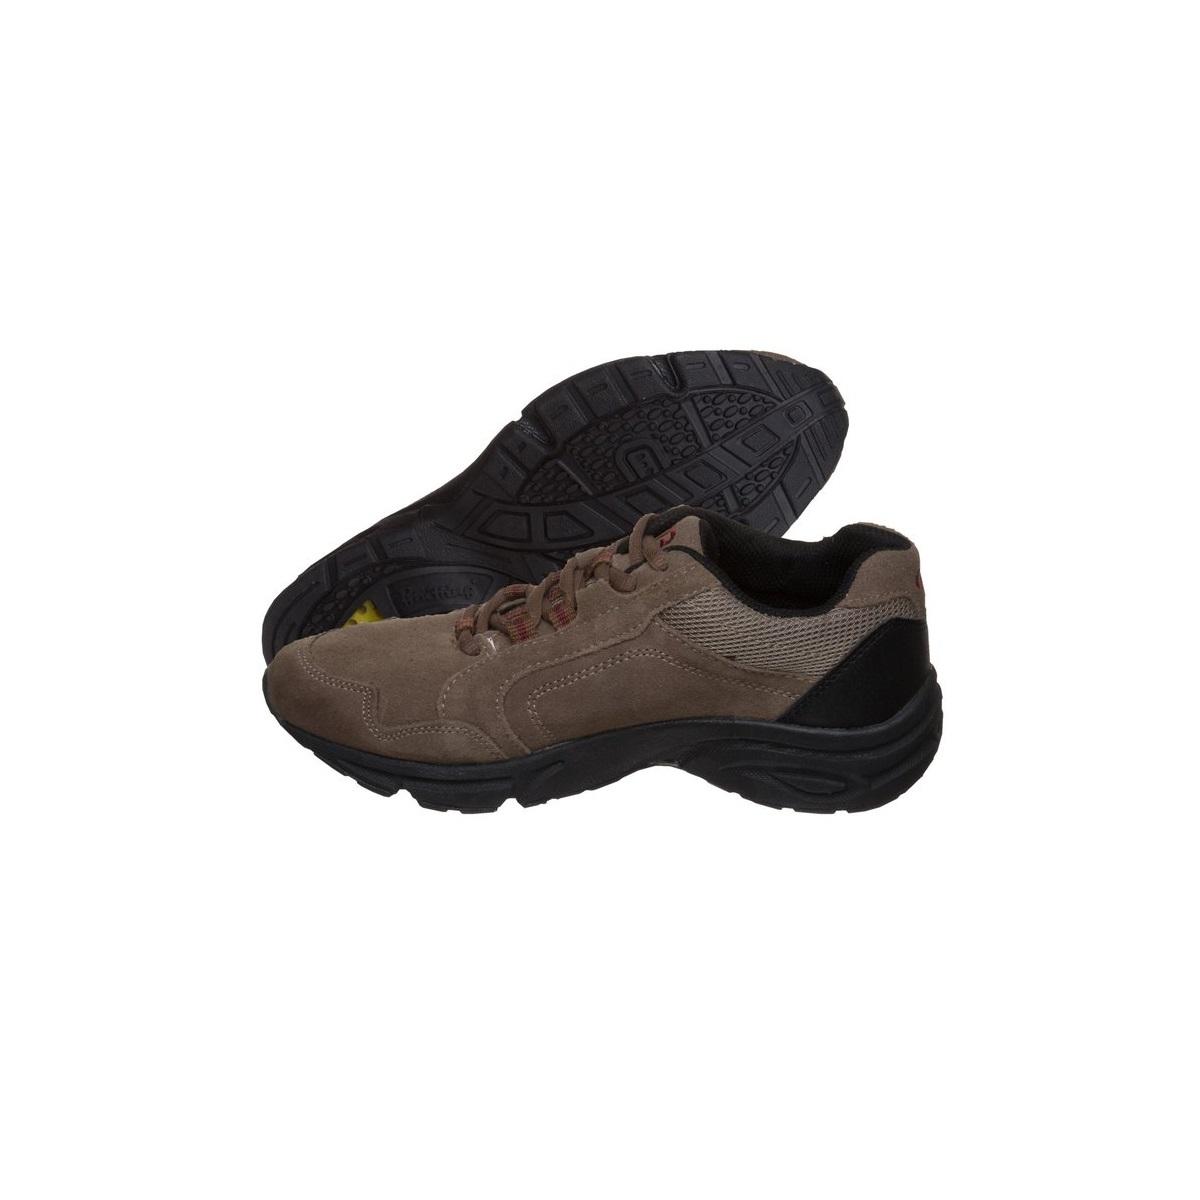 Brütting Circle Herren Nordic Walking Schuhe – Bild 2